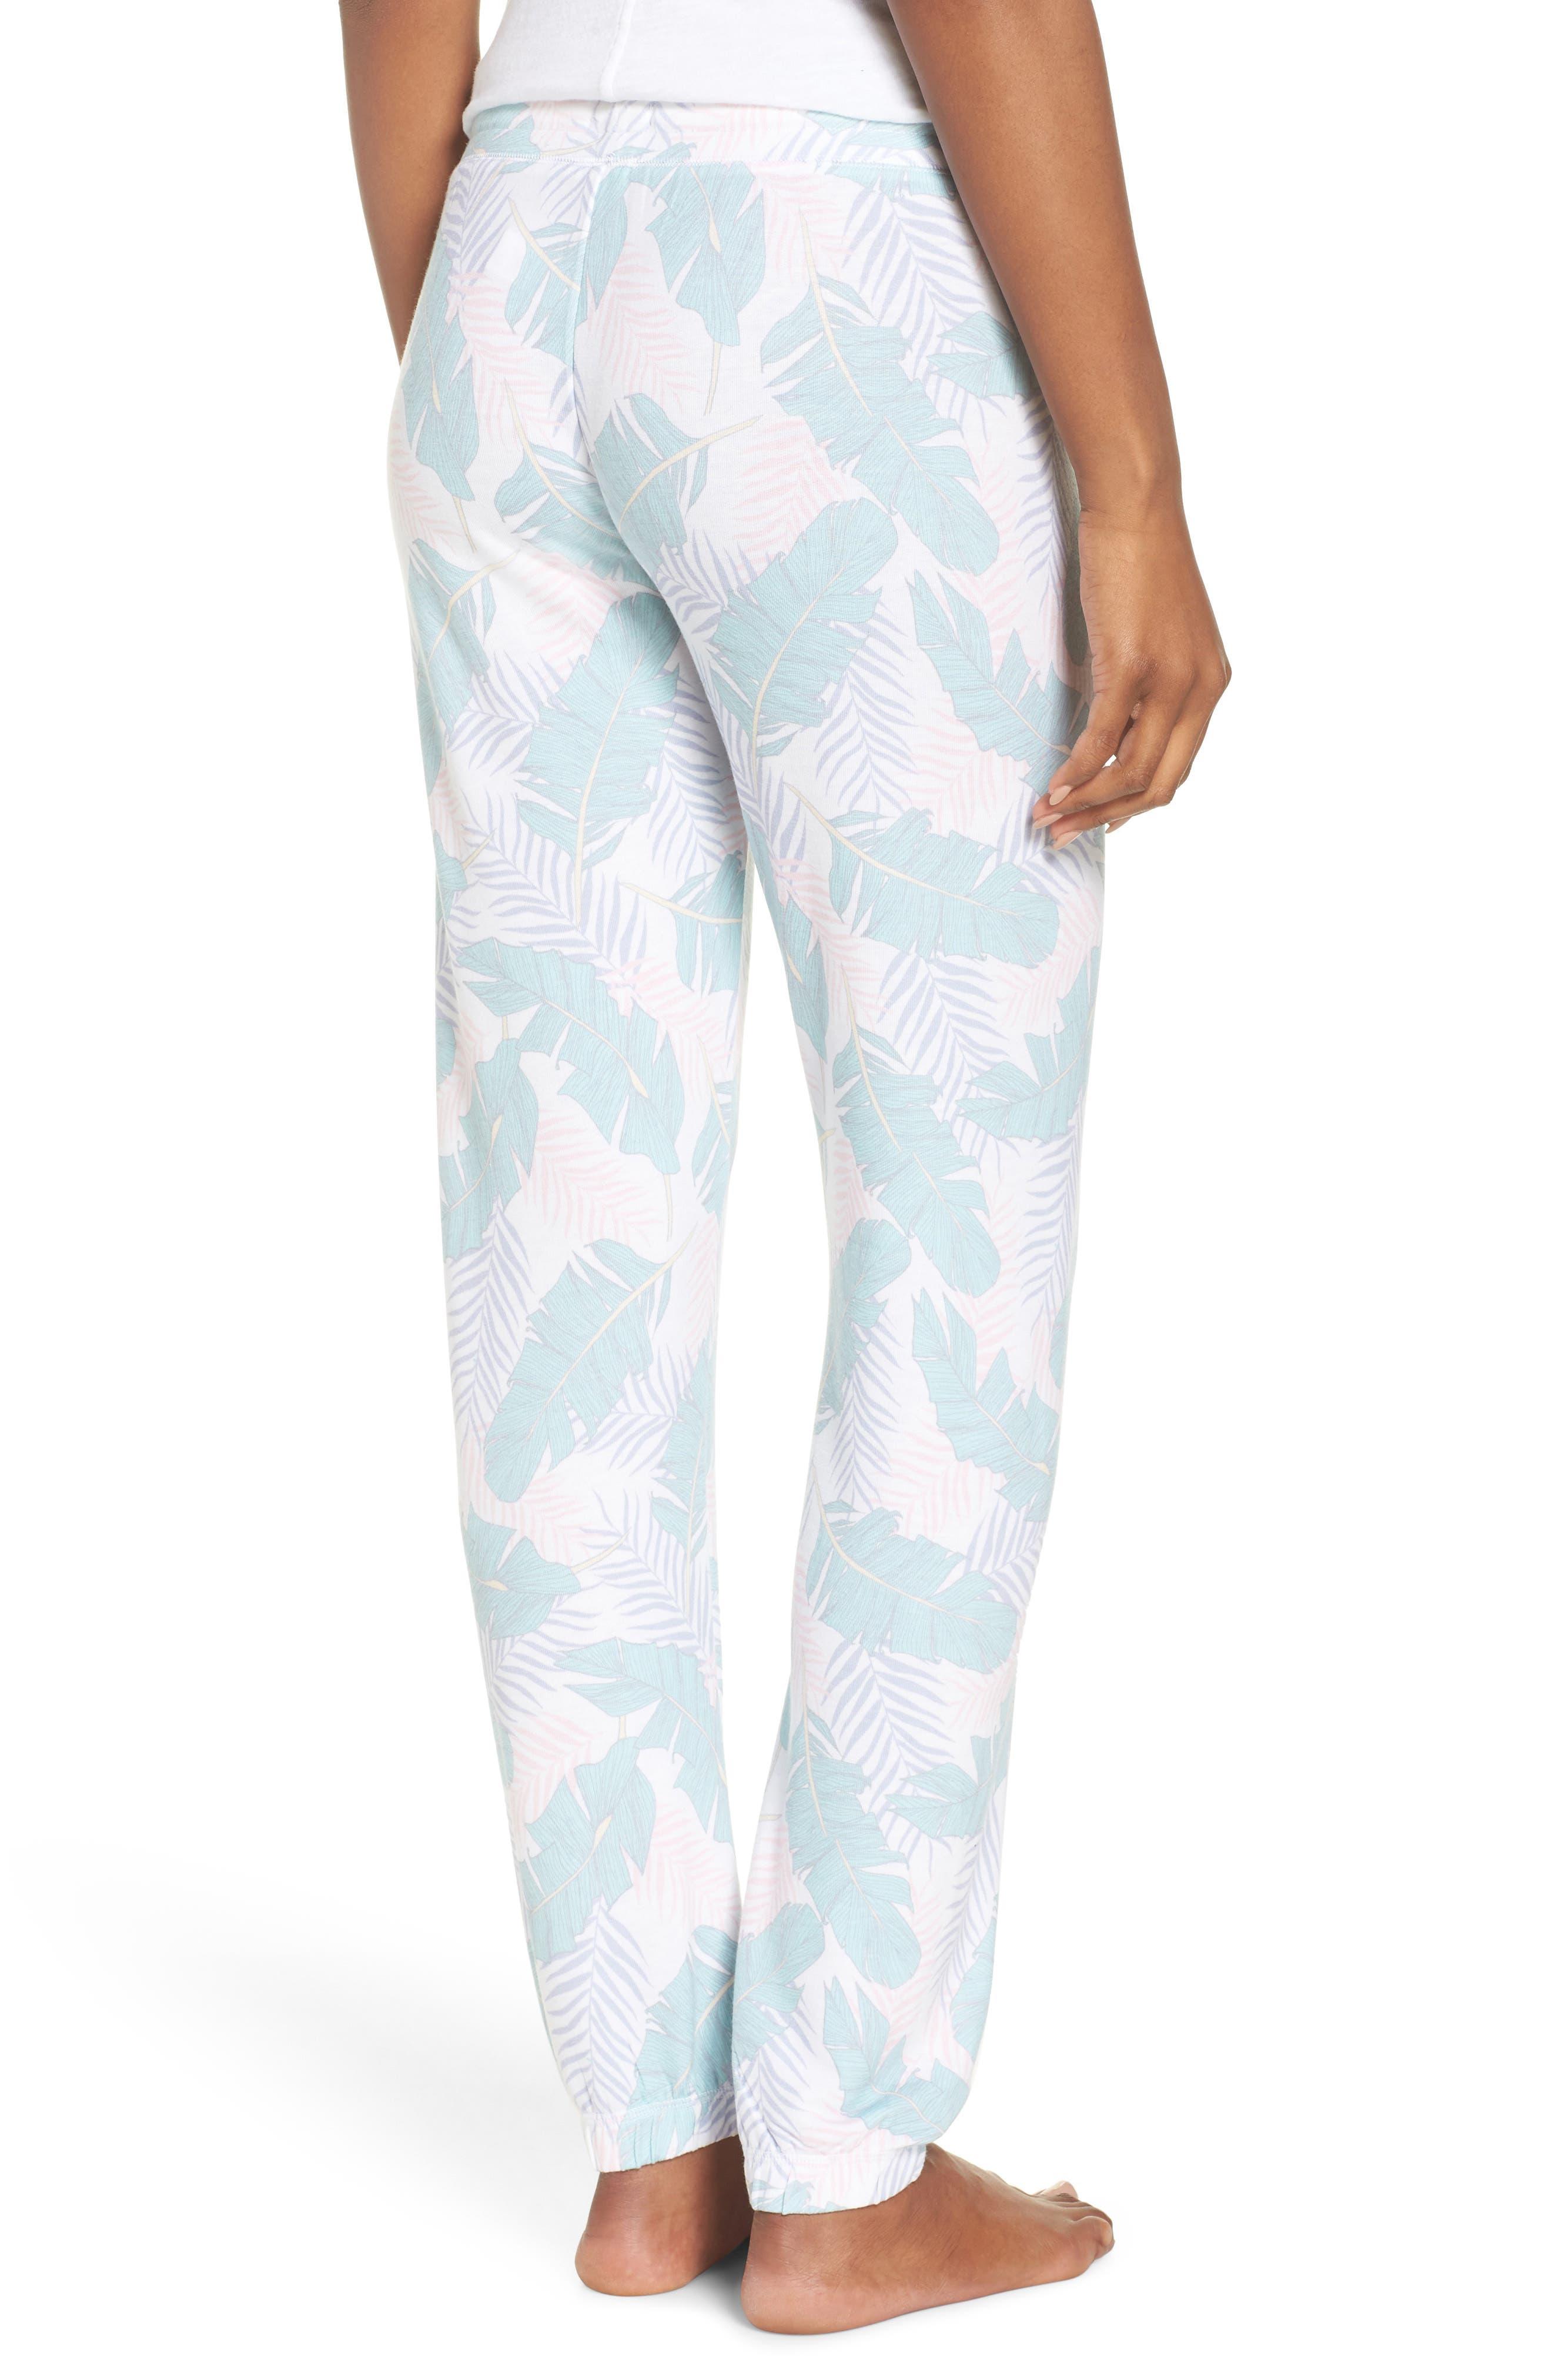 Peachy Jogger Lounge Pants,                             Alternate thumbnail 2, color,                             100